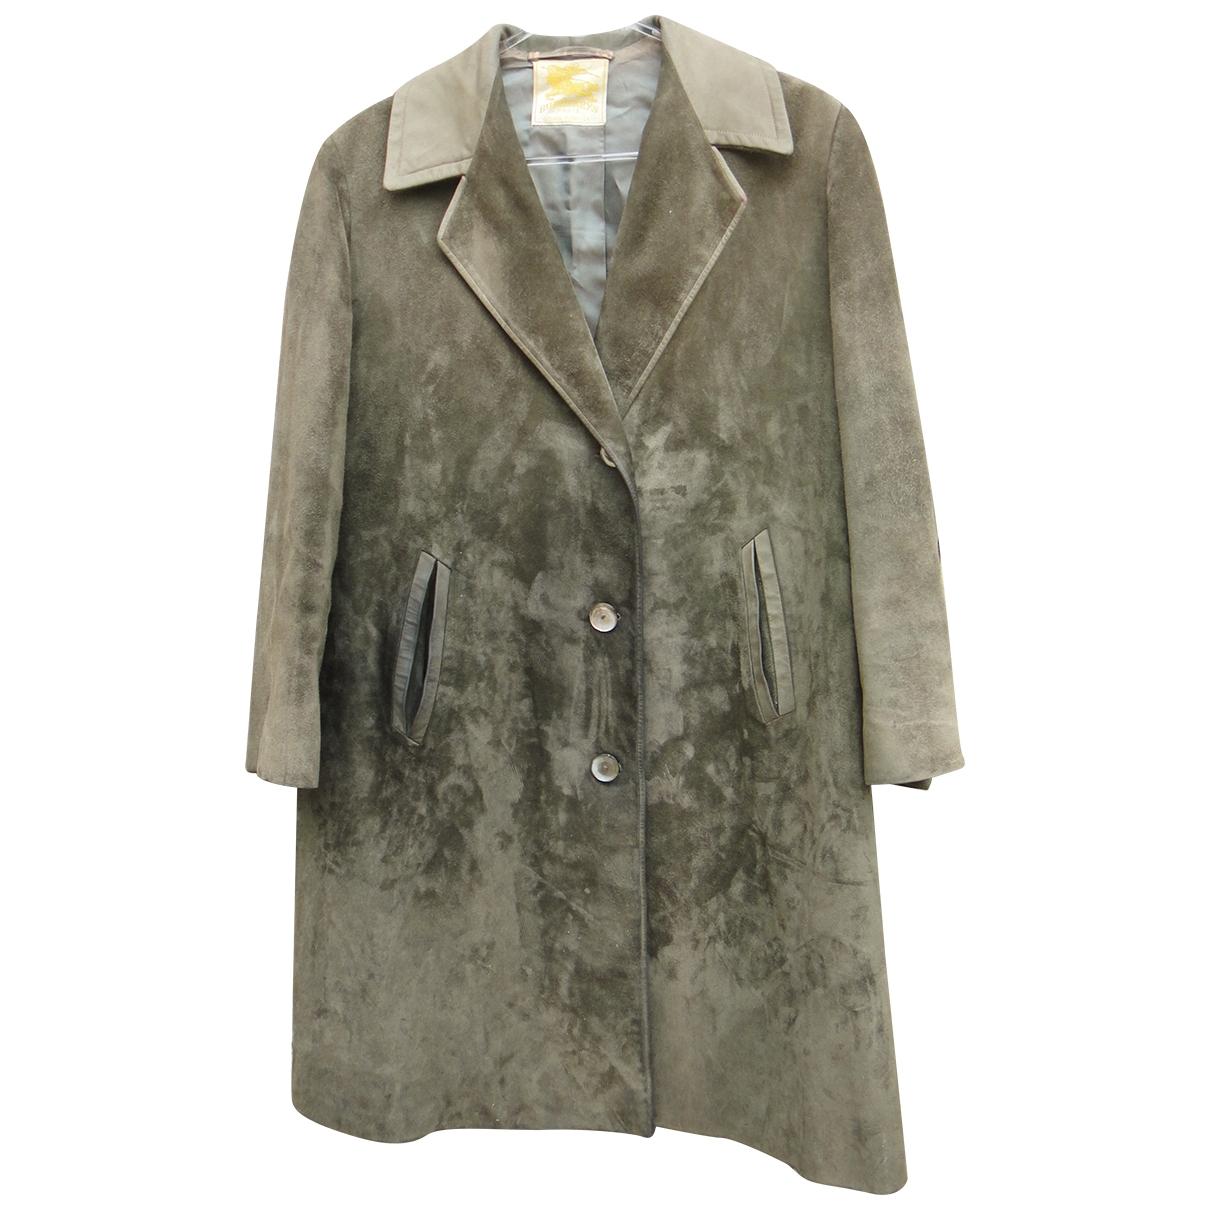 Burberry \N Green Leather coat for Women XL International